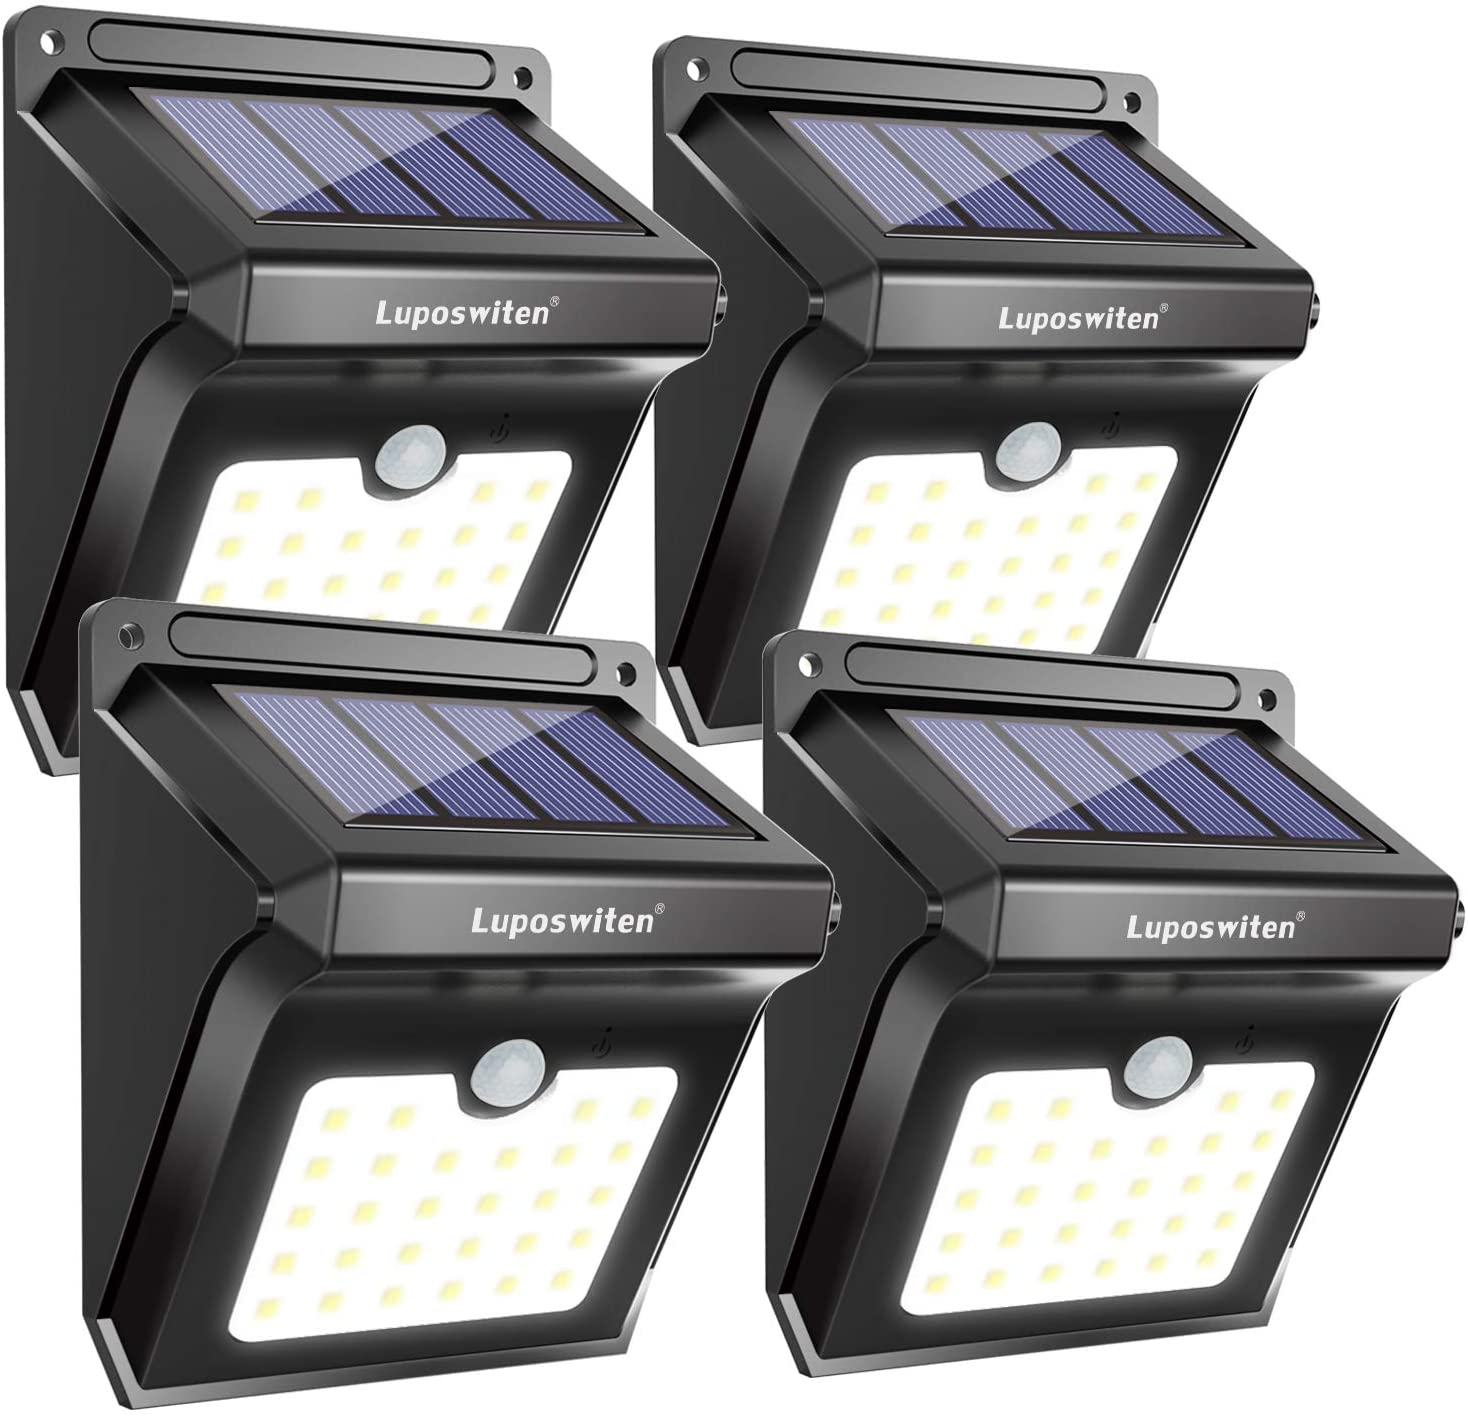 Luposwiten 28 LEDs Solar Lights Outdoor